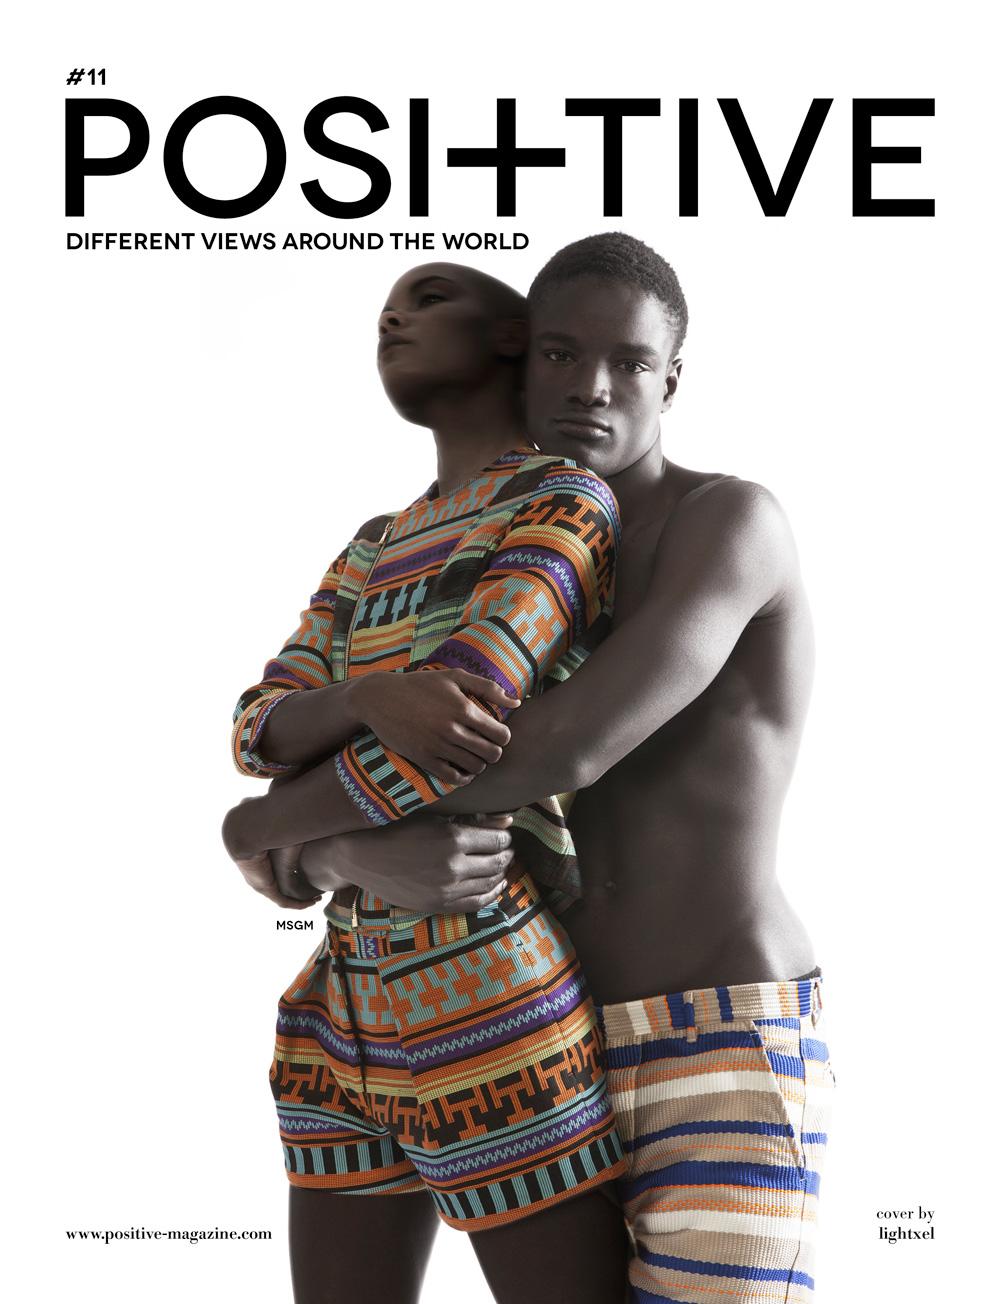 POSI+TIVE_11_COVER